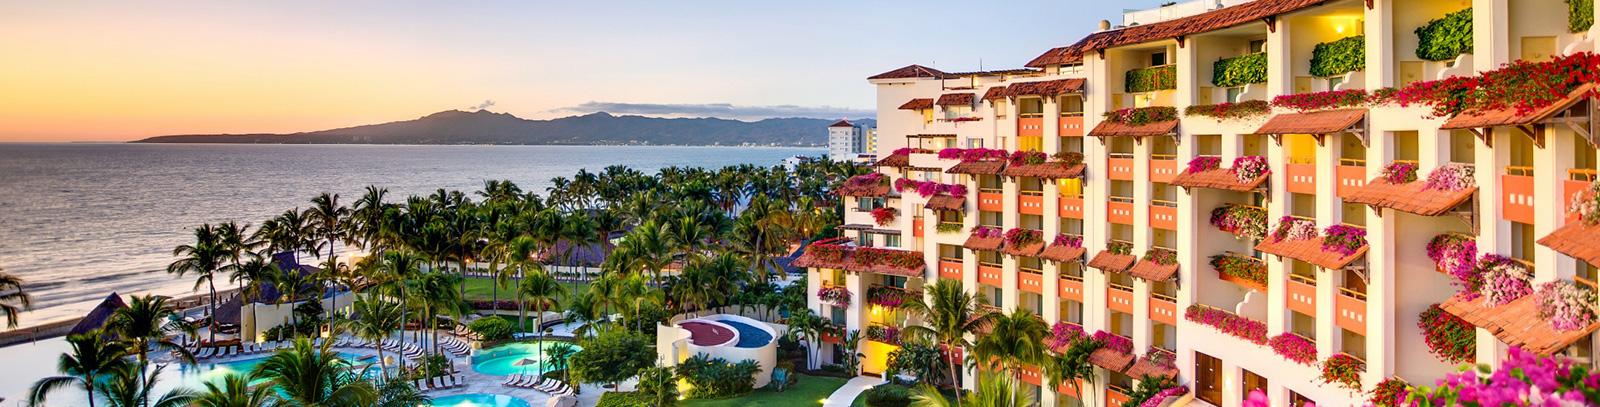 Ubicación de Grand Velas Riviera Nayarit, México